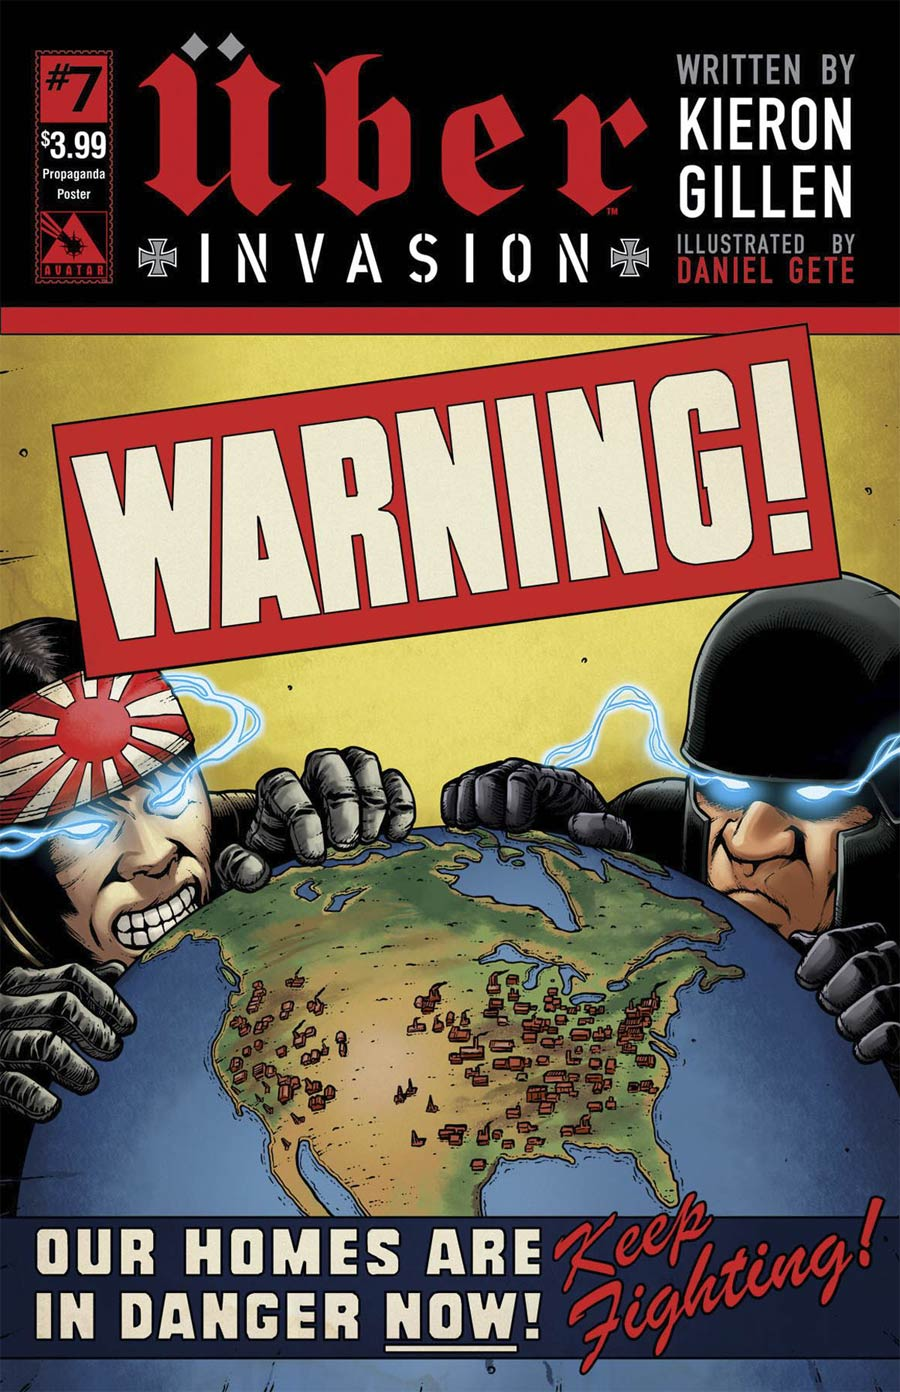 Uber Invasion #7 Cover D Propaganda Poster Cover